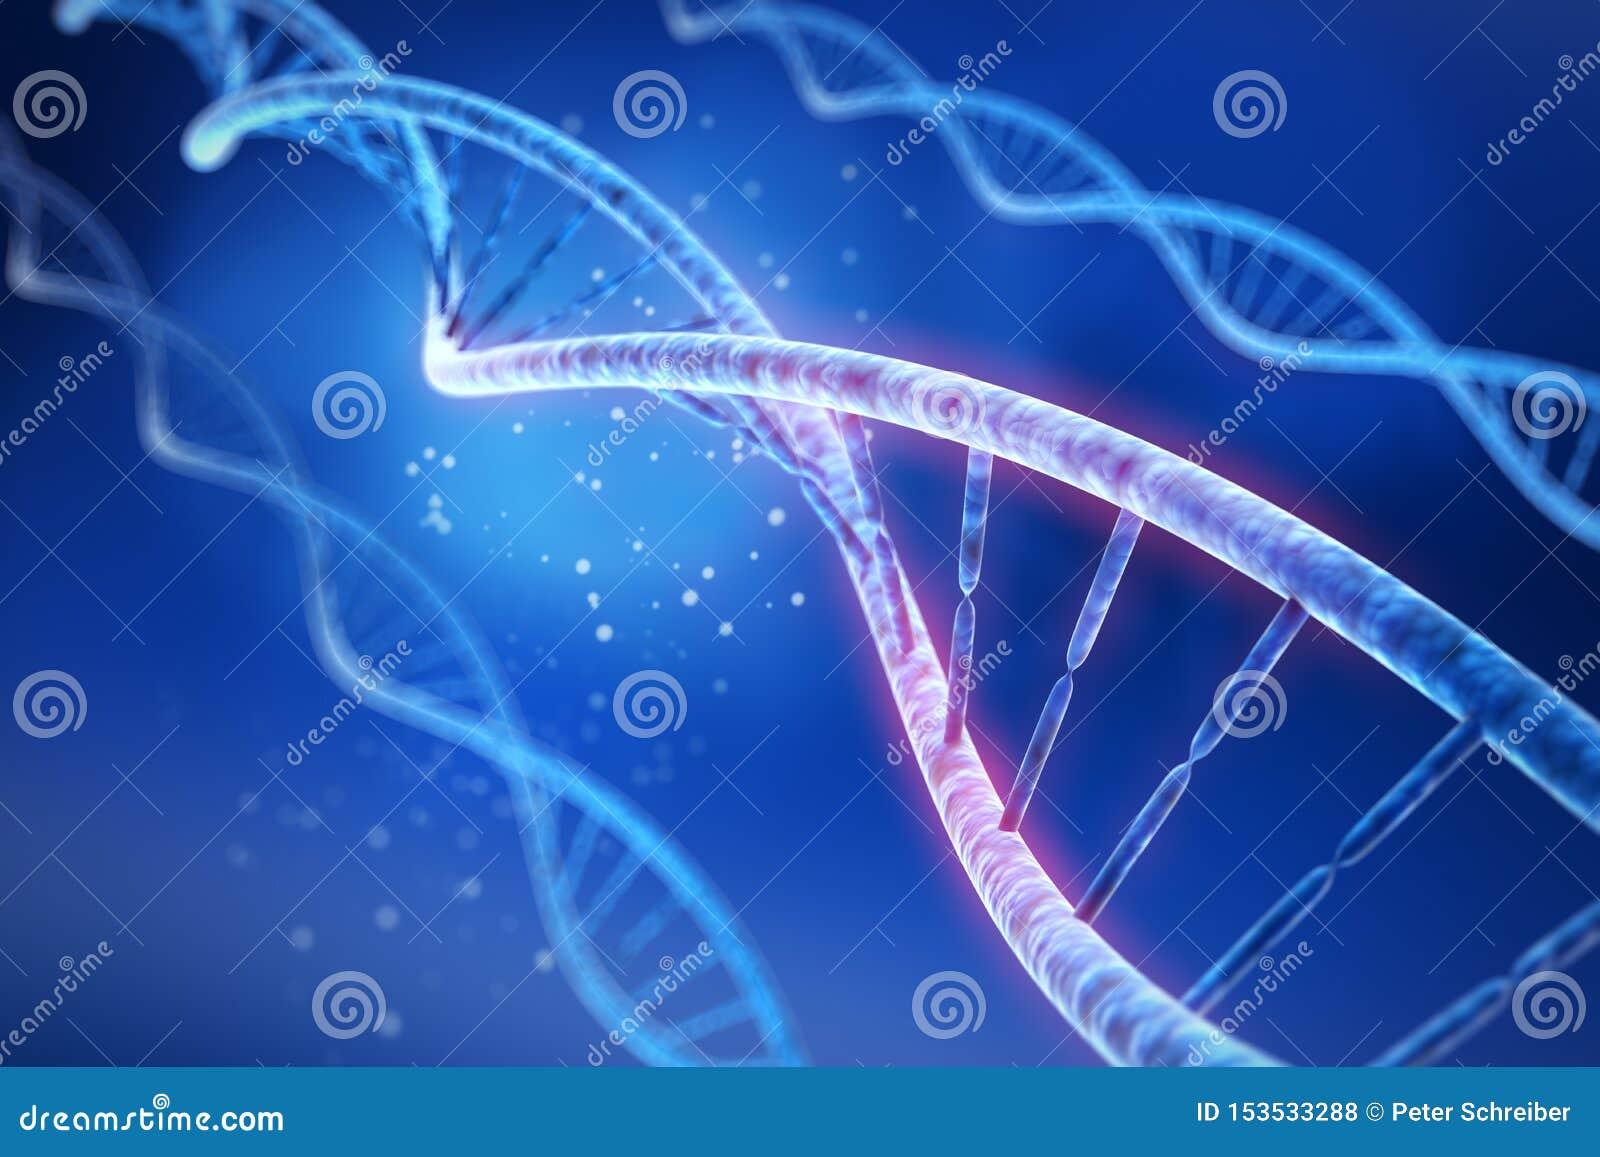 DNA - medizinische Illustration 3D